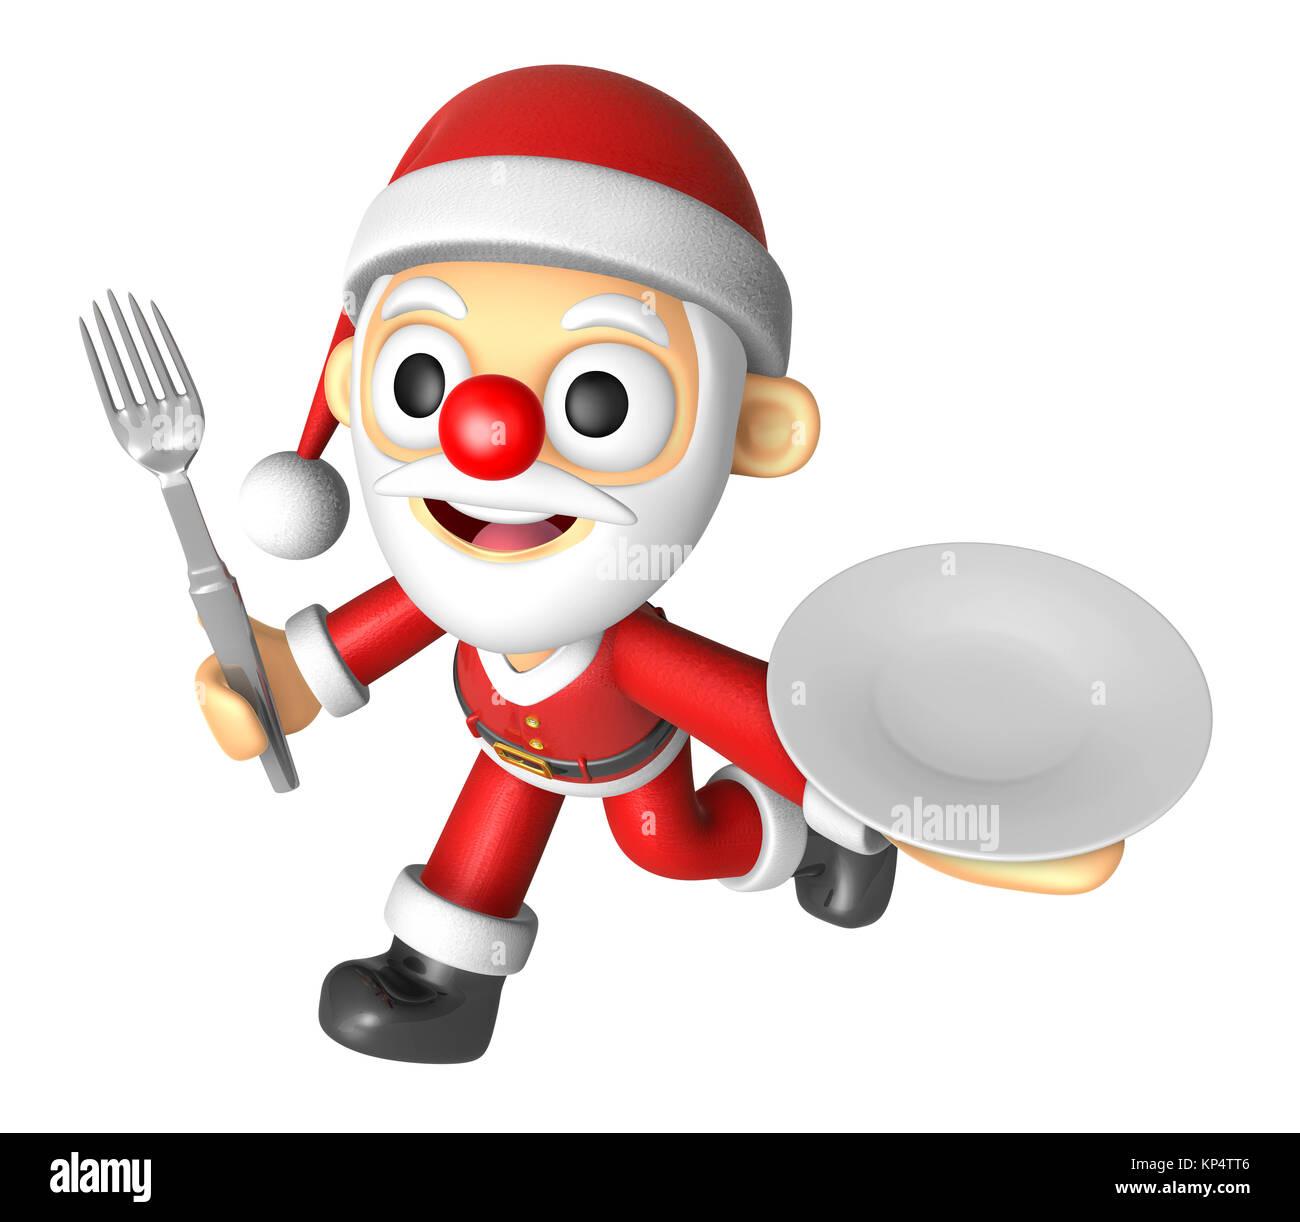 Kitchen Designer Jobs Long Island Ny: Cartoon Fork Stock Photos & Cartoon Fork Stock Images